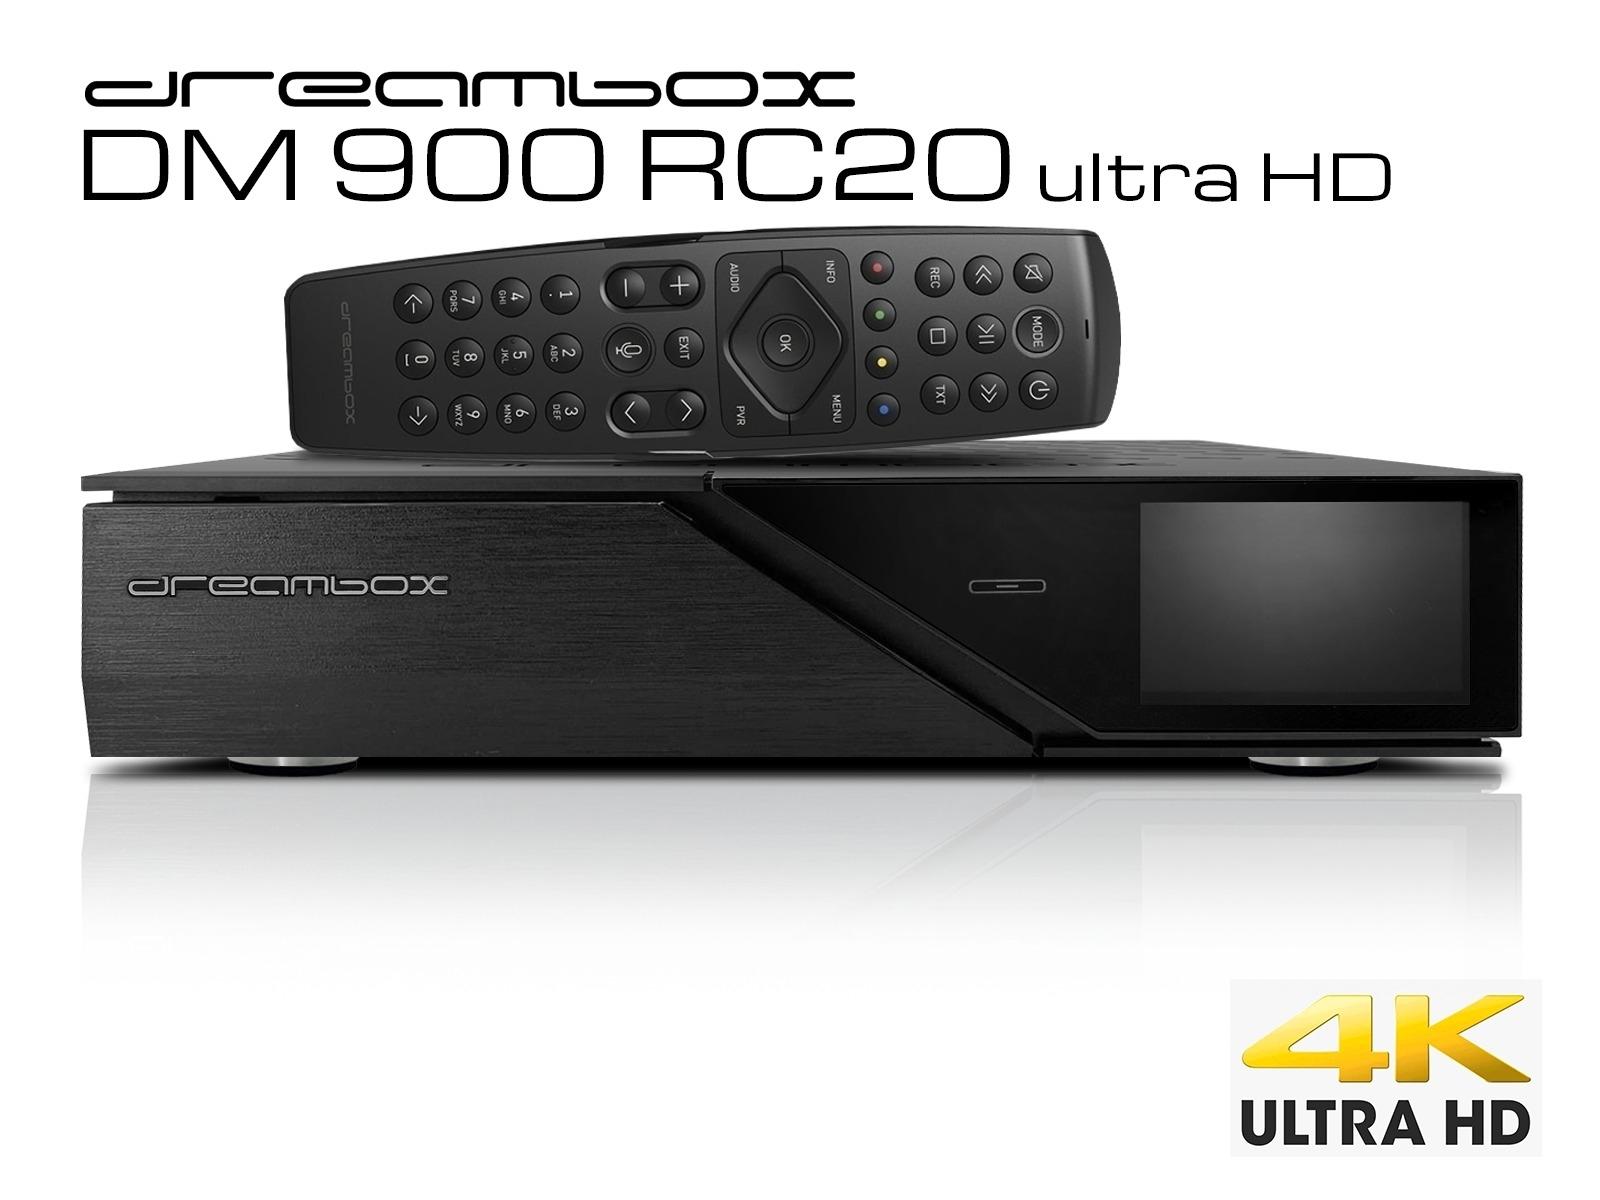 Dreambox DM900 RC20 UHD 4K 1x DVB-S2X FBC MS Twin Tuner E2 Linux PVR ready Receiver